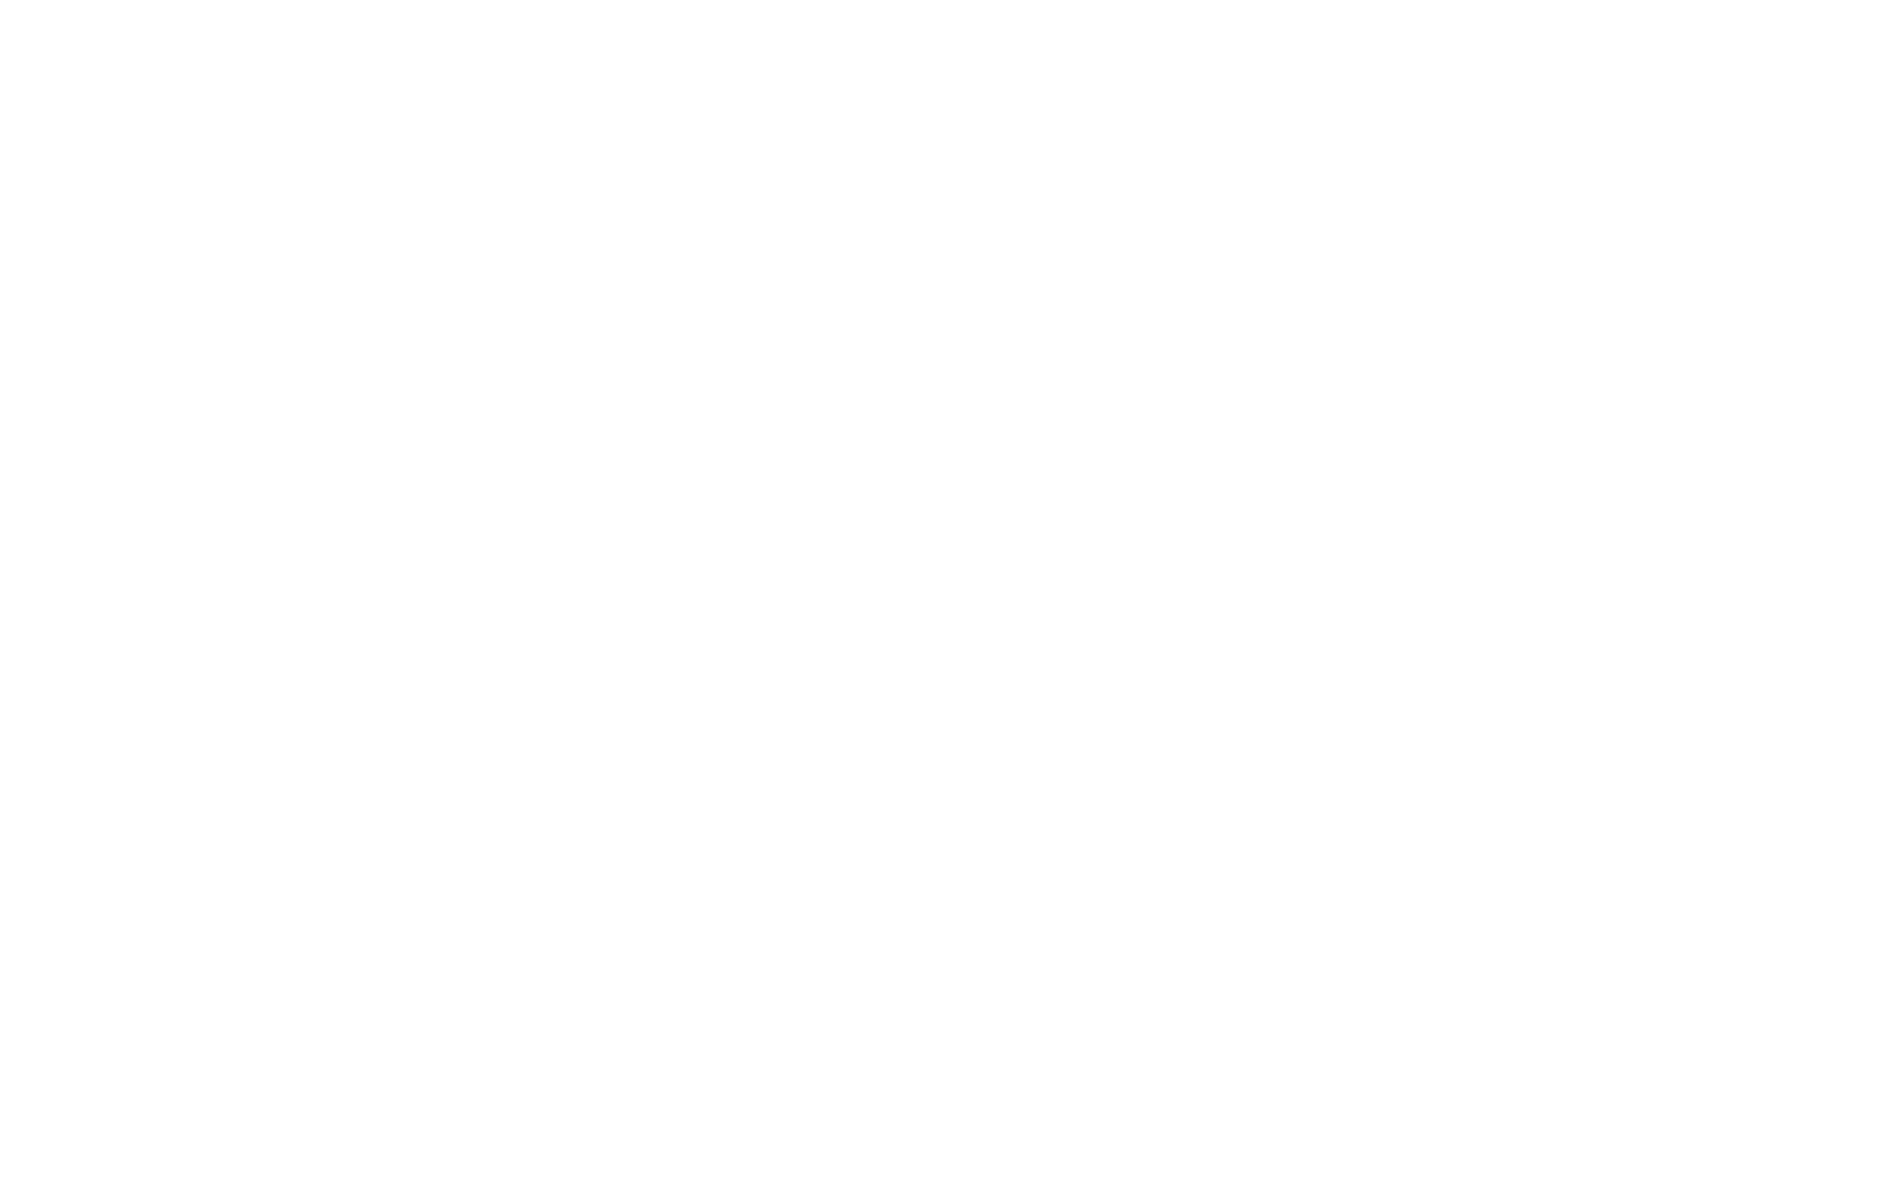 flux-biohotel-logo-klemm-design-Restaurant